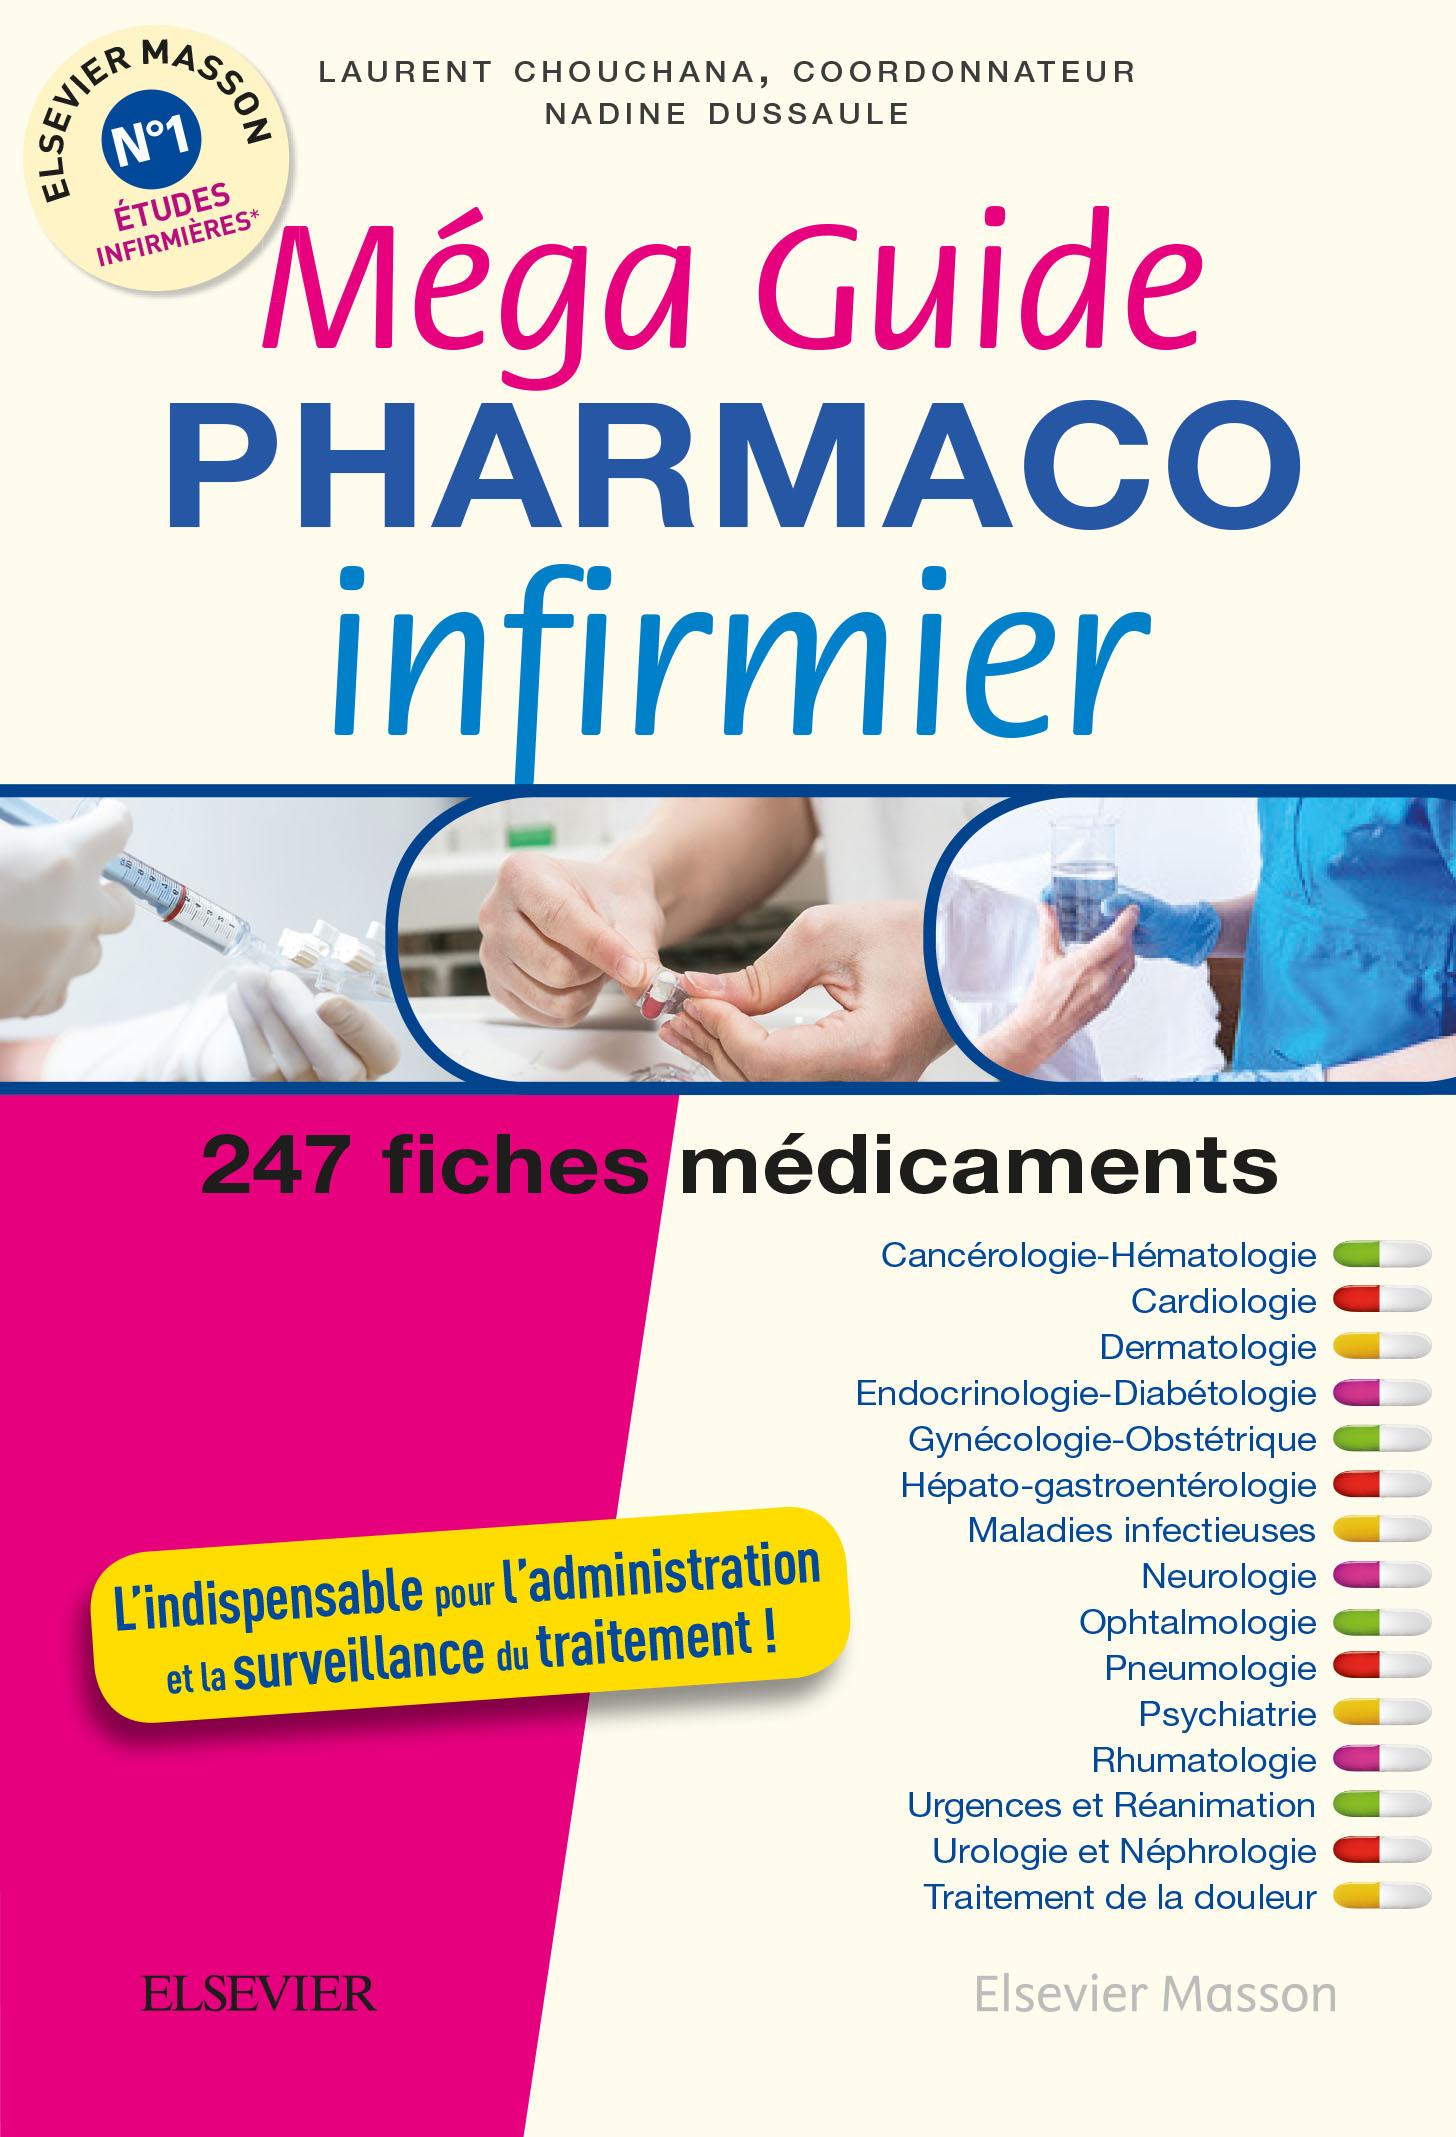 Megaguide Pharmaco Infirmier